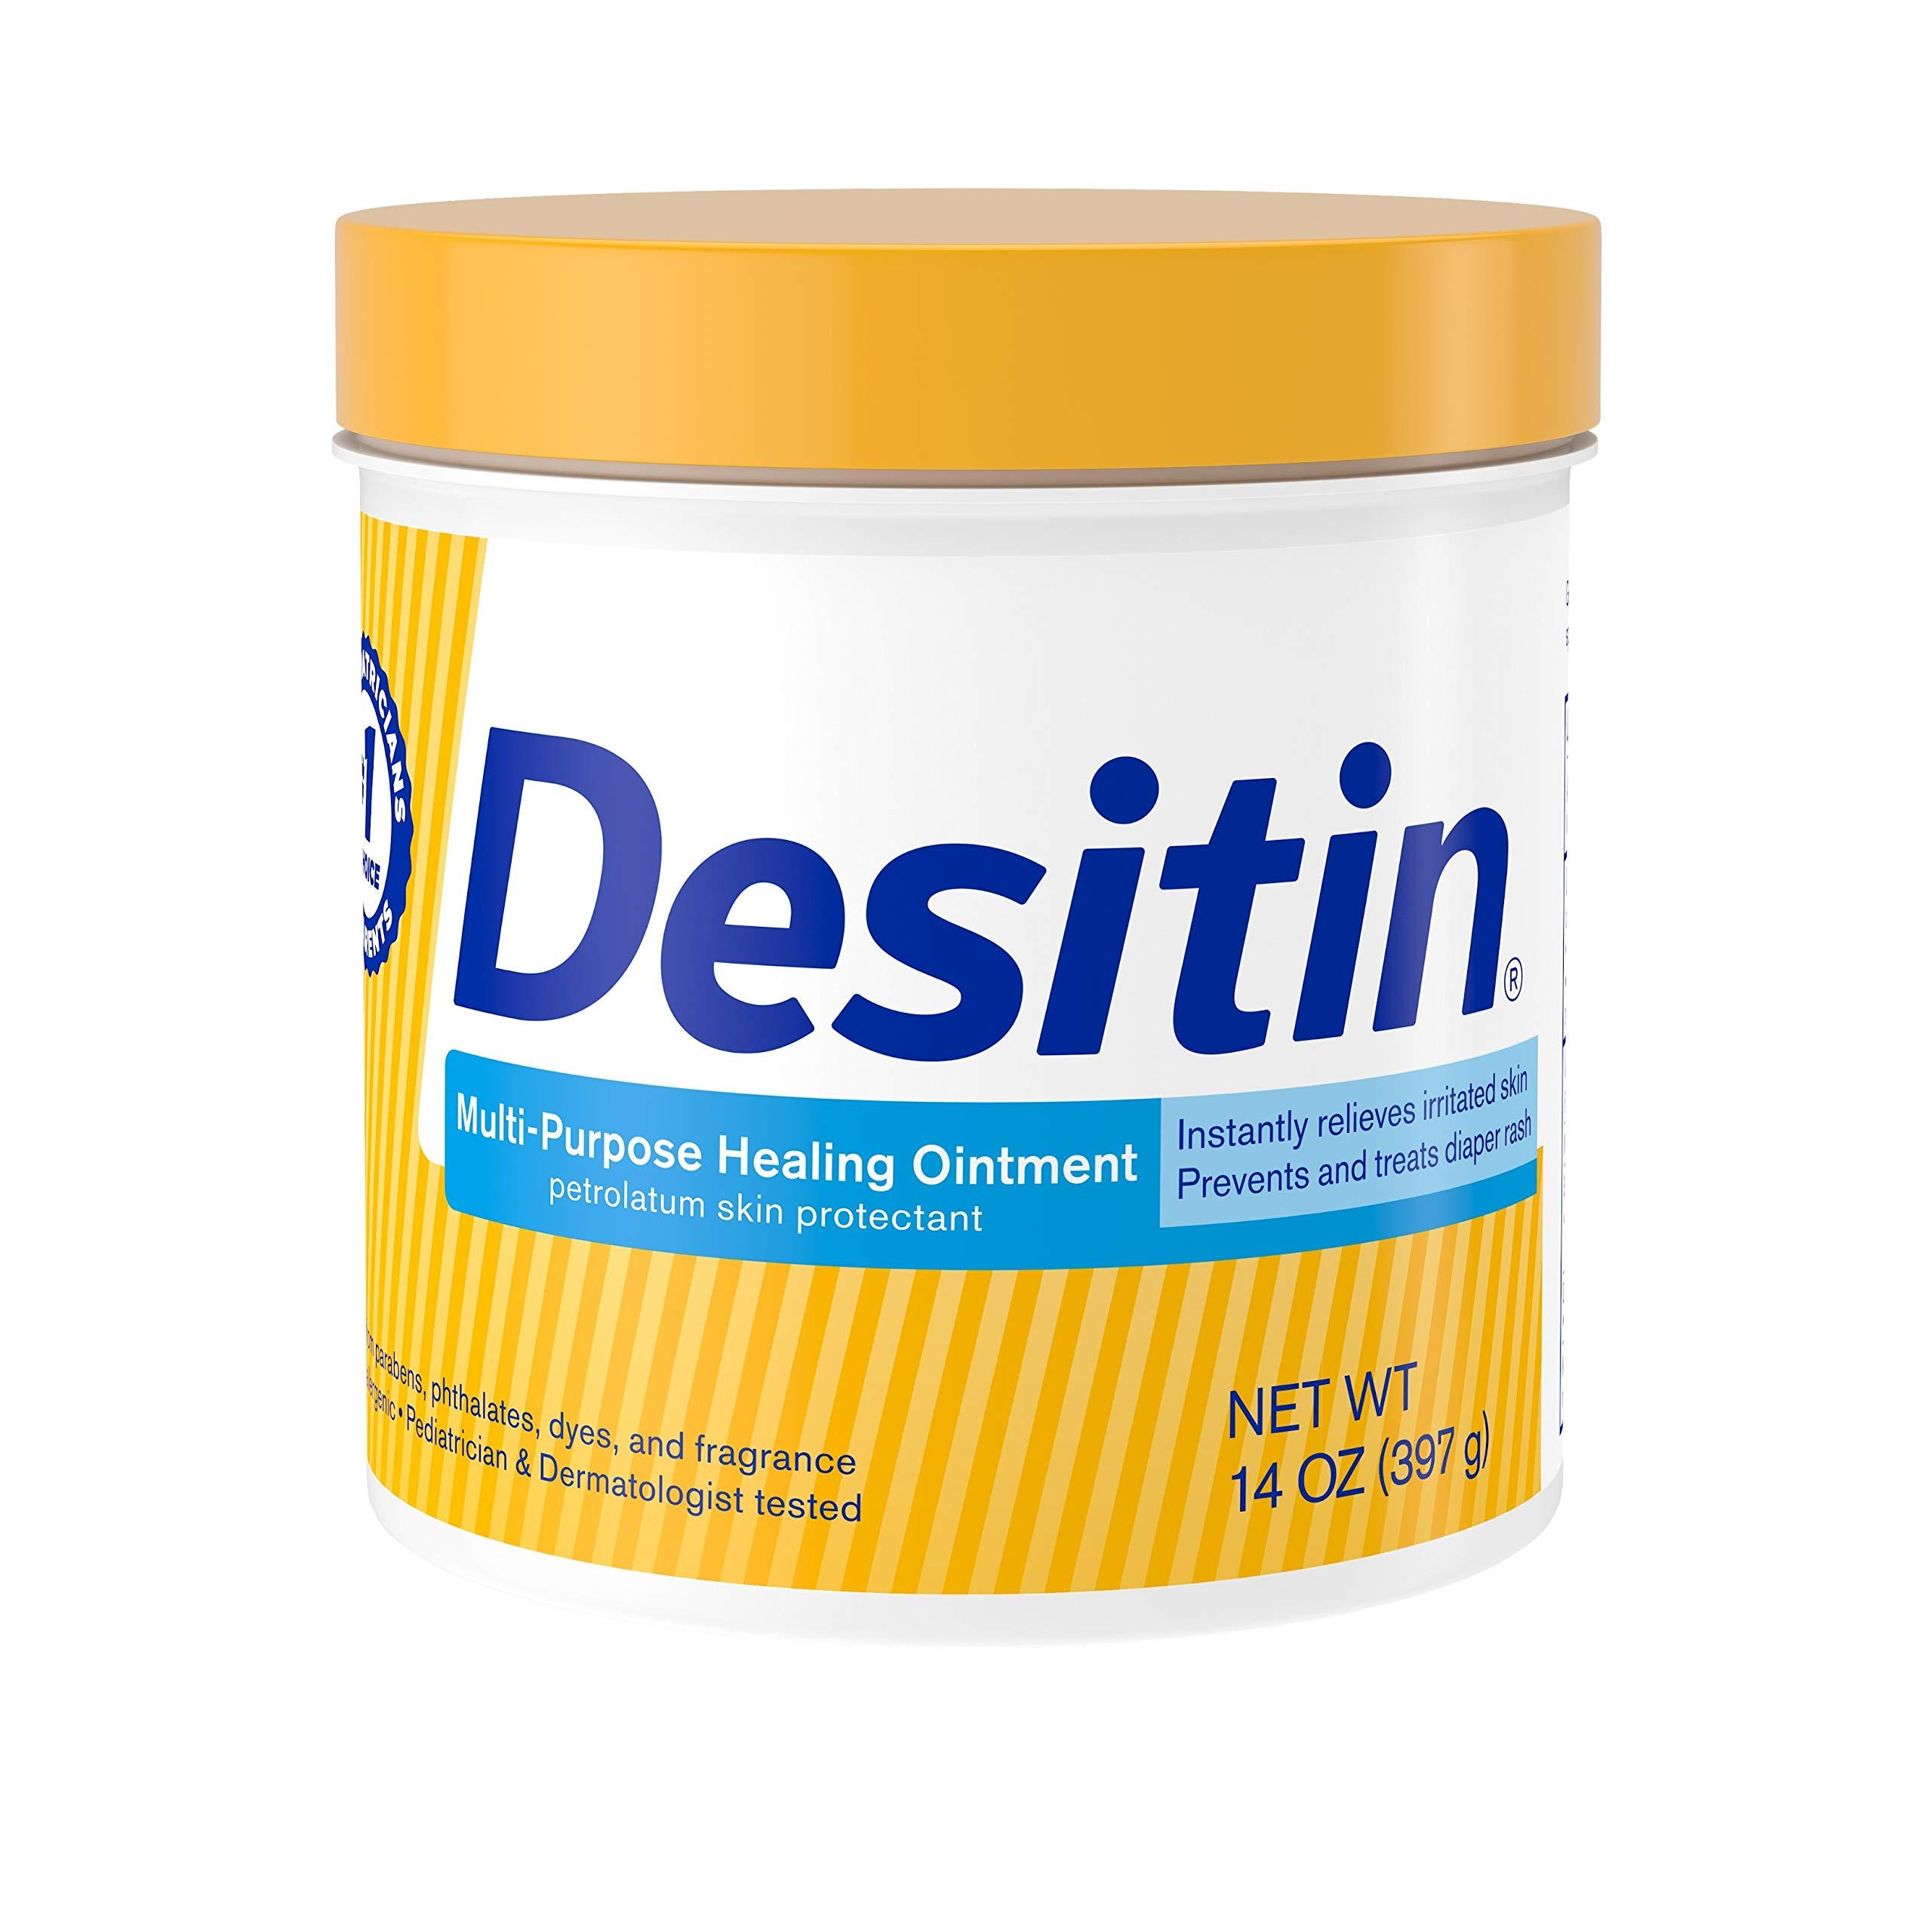 Desitin Multipurpose Baby Diaper Rash Ointment & Skin Protectant with White Petrolatum, 14 oz by Desitin